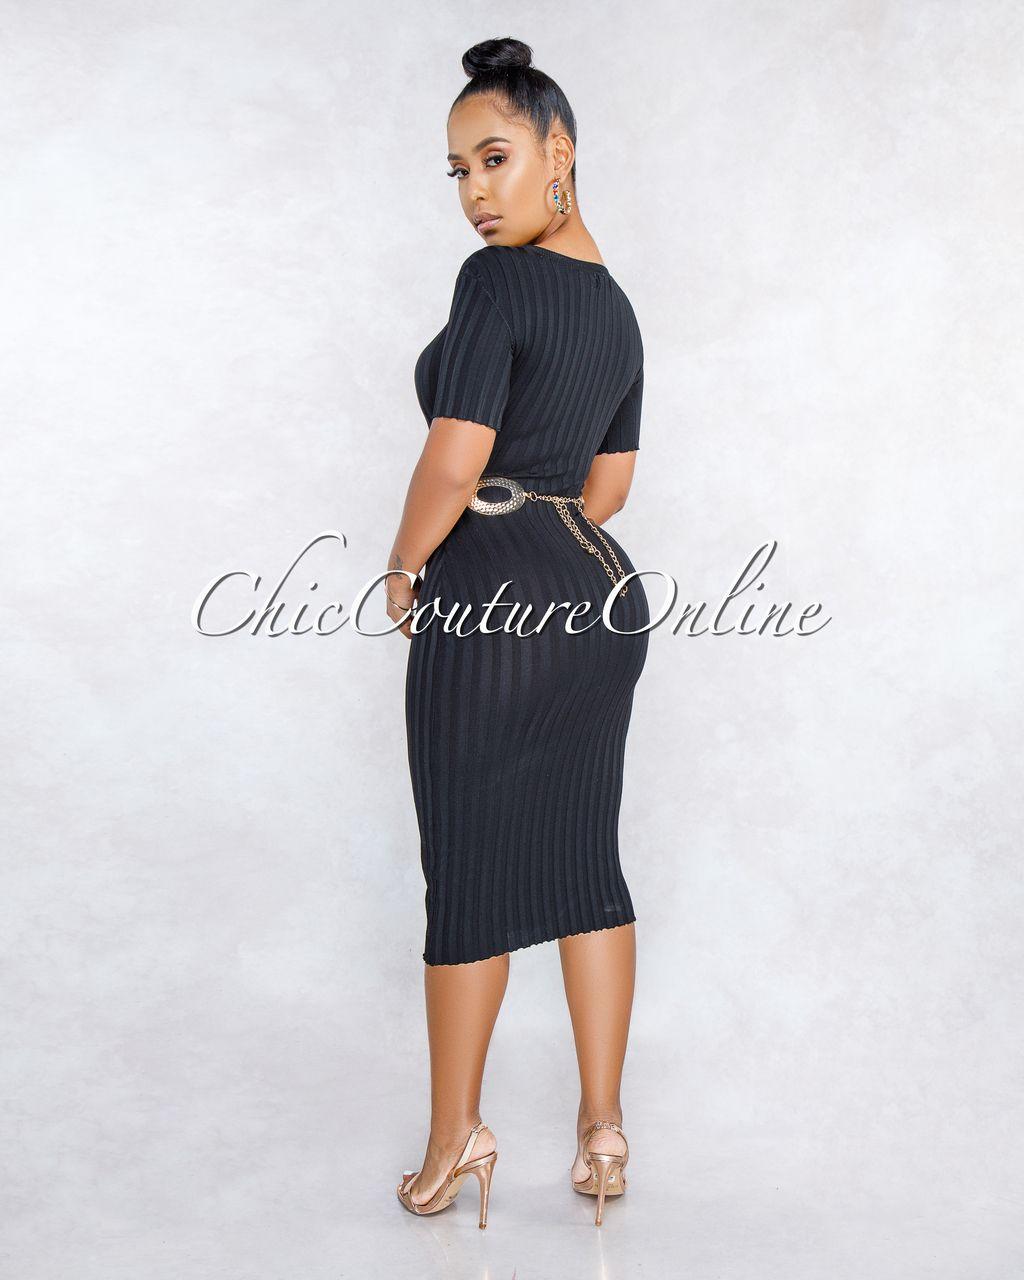 d70019d87a797 Mandriana Black Short Sleeves Ribbed Midi Dress in 2019 | Clothing ...